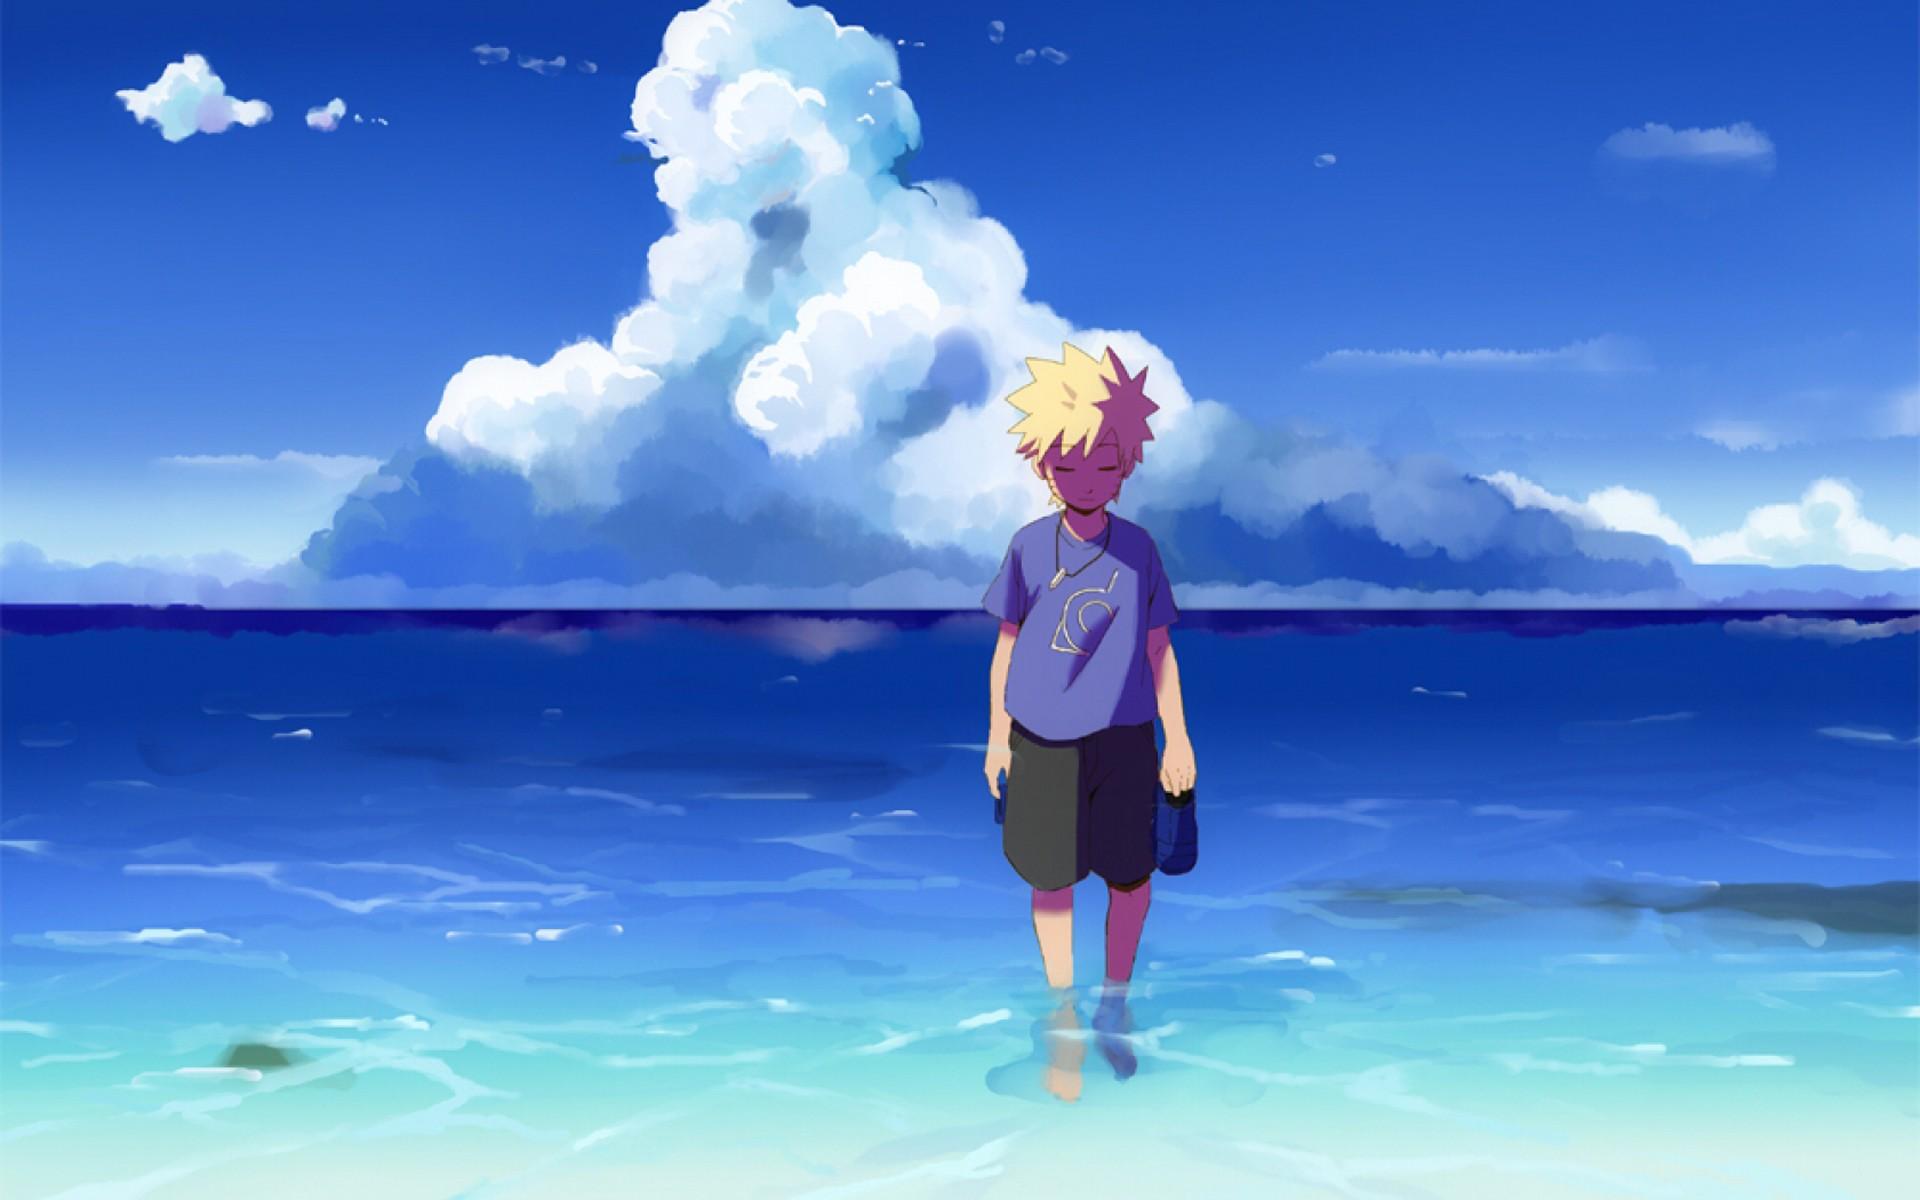 Must see Wallpaper Naruto Blue - sunlight-landscape-digital-art-sea-anime-water-sky-beach-blue-Naruto-Shippuuden-wind-horizon-Uzumaki-Naruto-Masashi-Kishimoto-vacation-cloud-ocean-wave-computer-wallpaper-wind-wave-3164  Graphic_695846.jpg